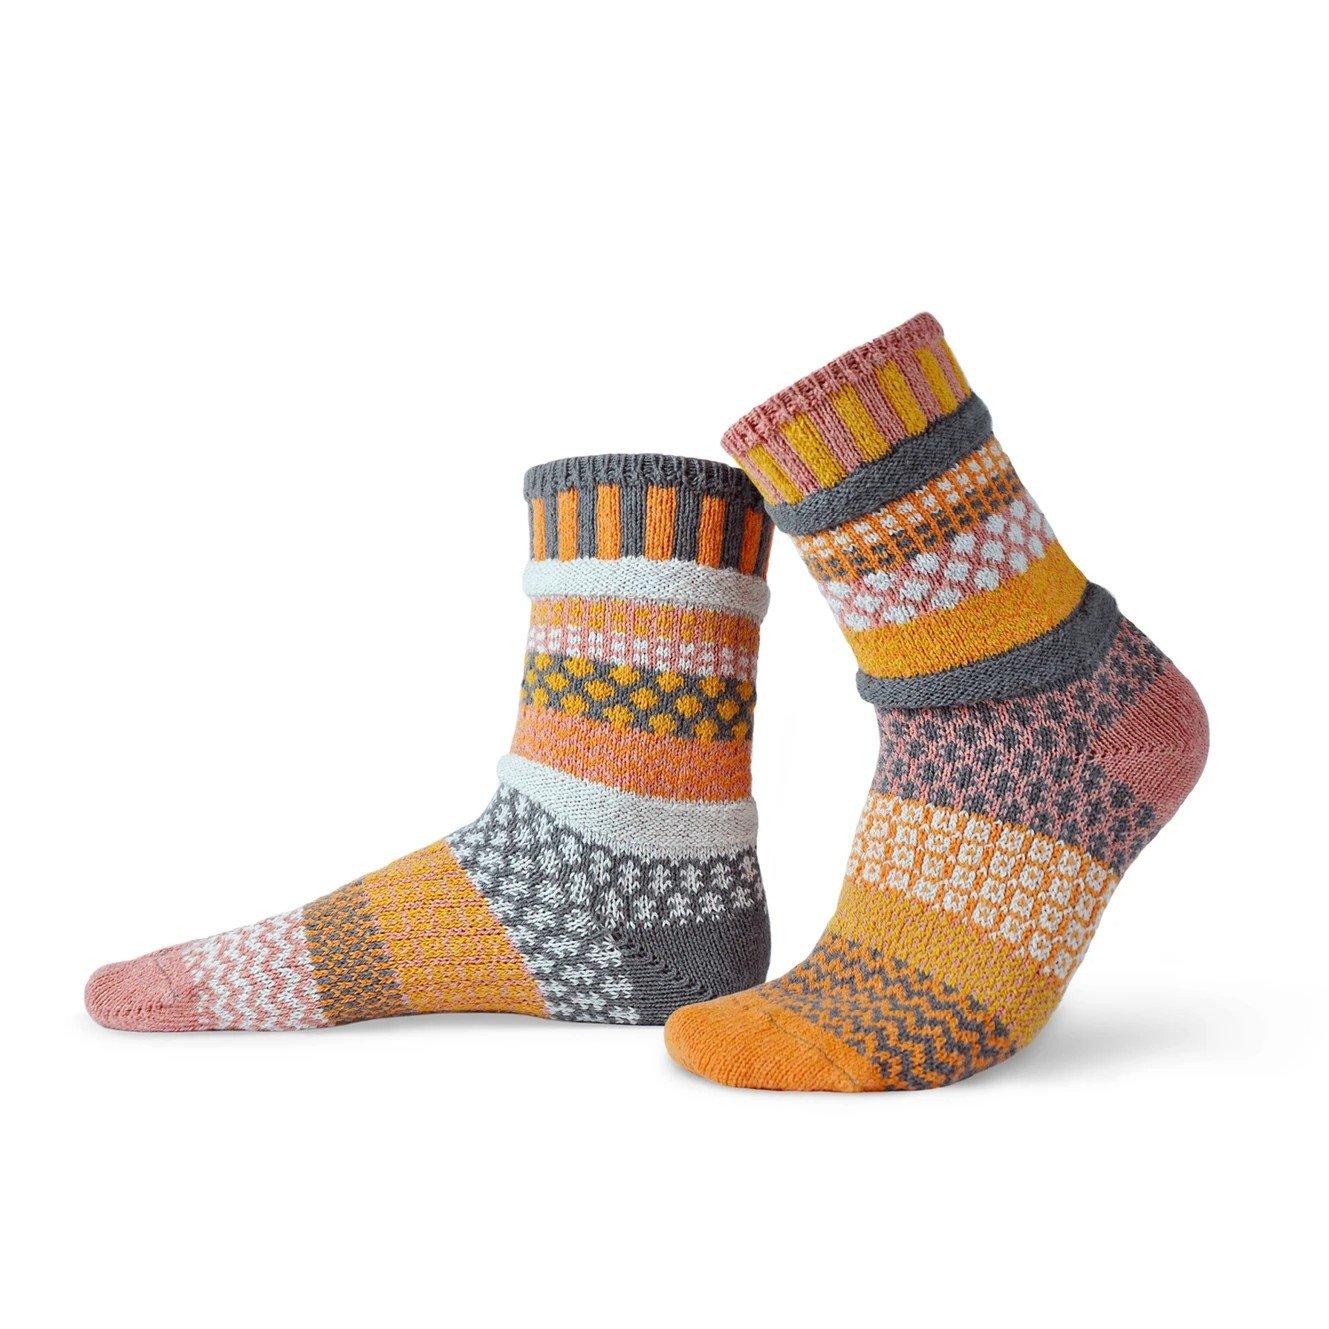 Buckwheat Adult Crew Socks